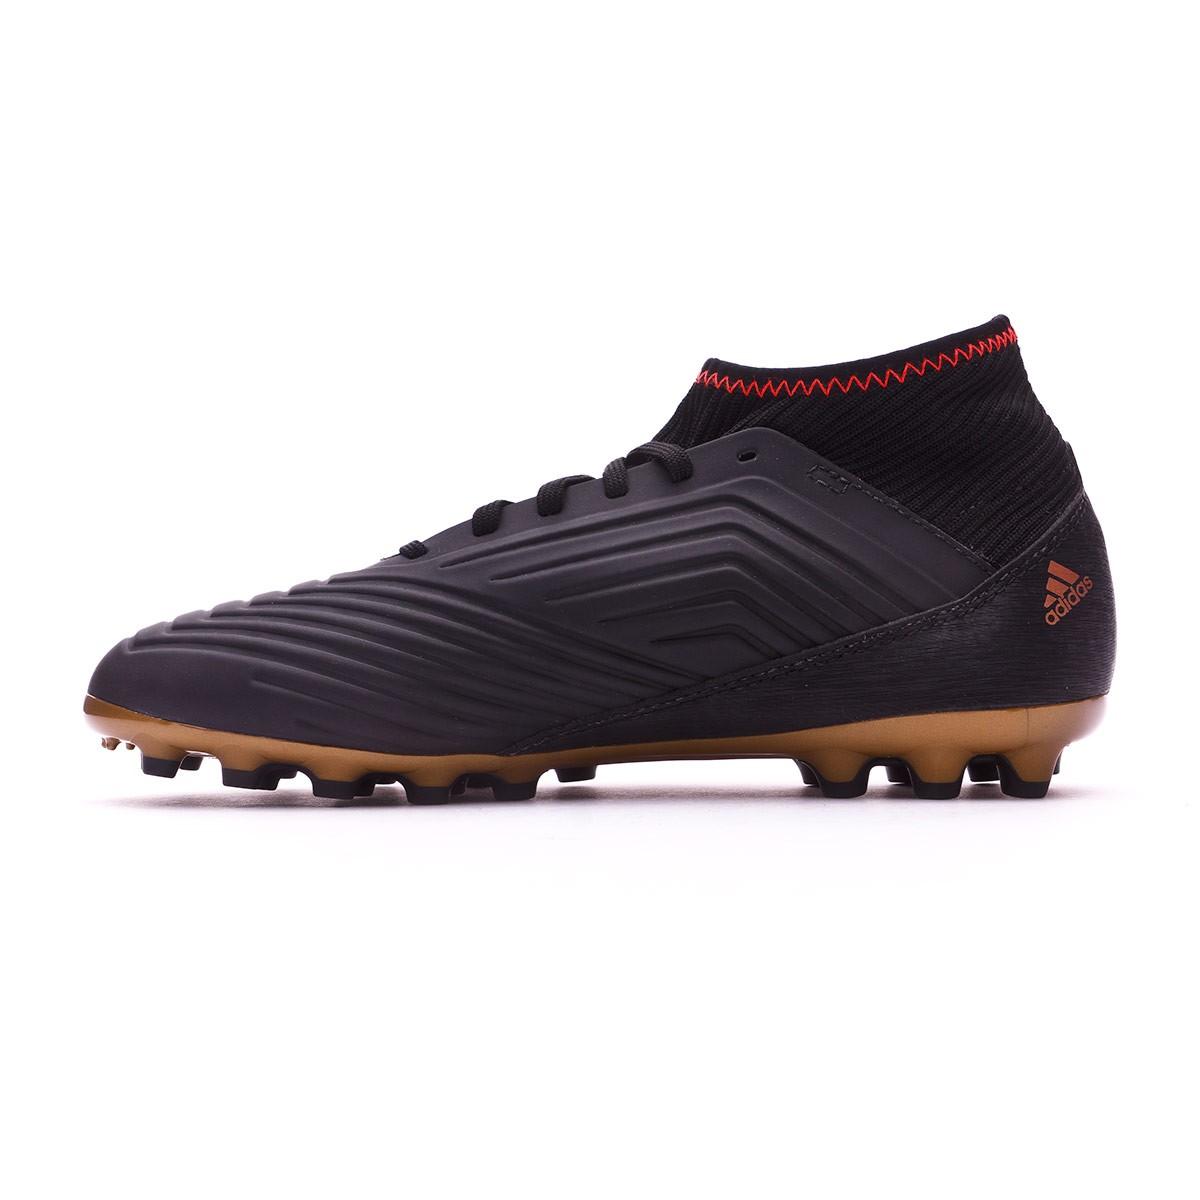 cdfeb334044 Football Boots adidas Kids Predator 18.3 AG Core black-White-Gold  metallic-Solar red - Tienda de fútbol Fútbol Emotion